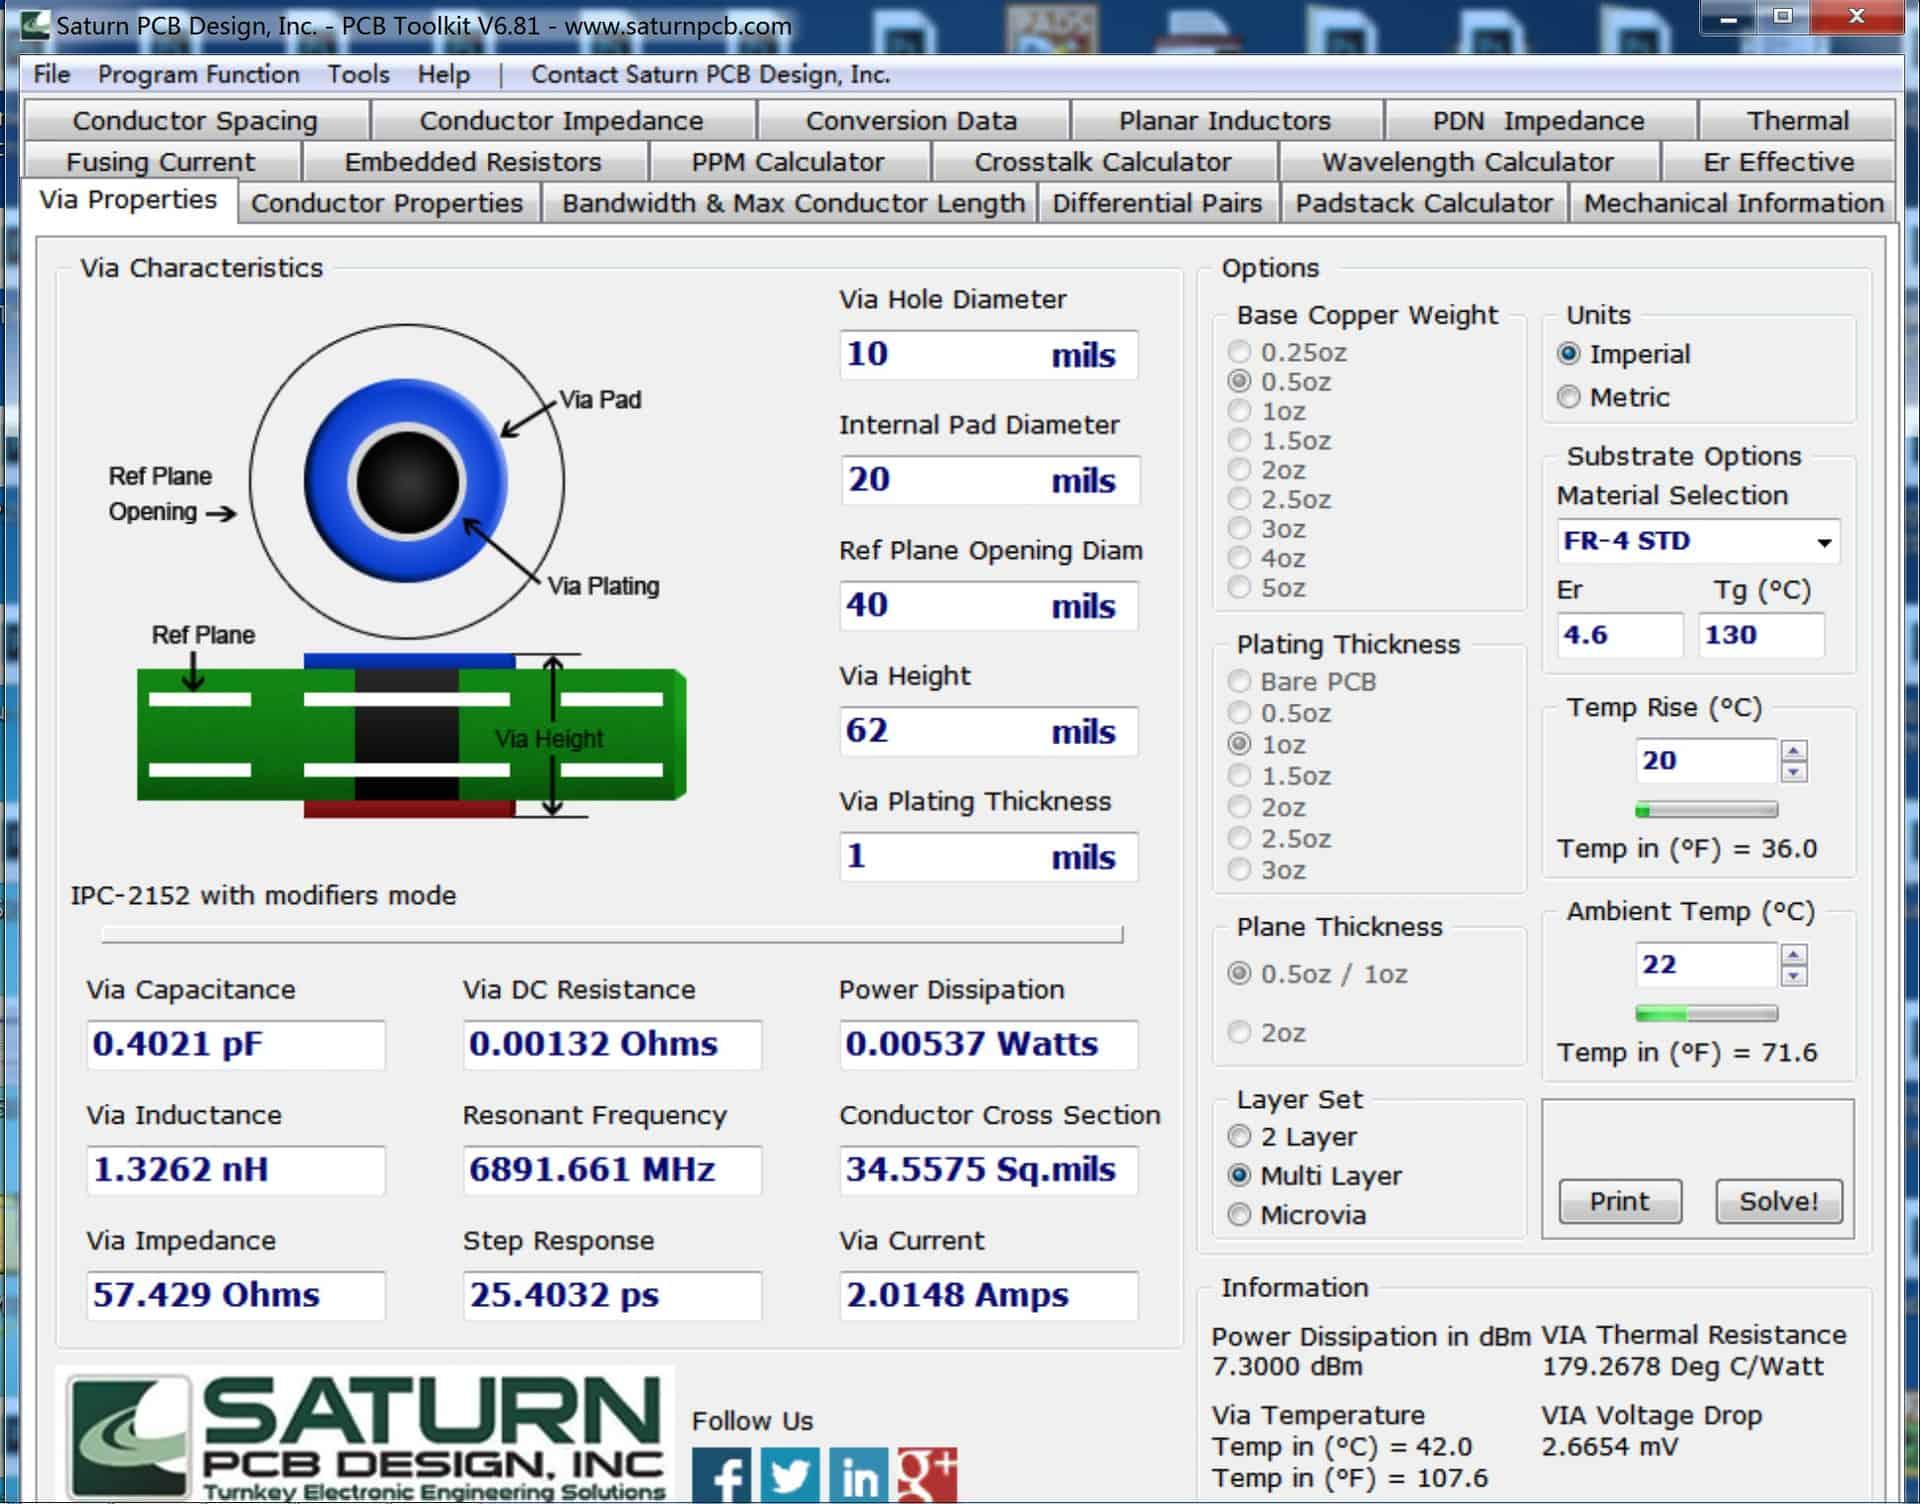 PCB参数计算神器-Saturn PCB Design Toolkit下载及安装指南-2